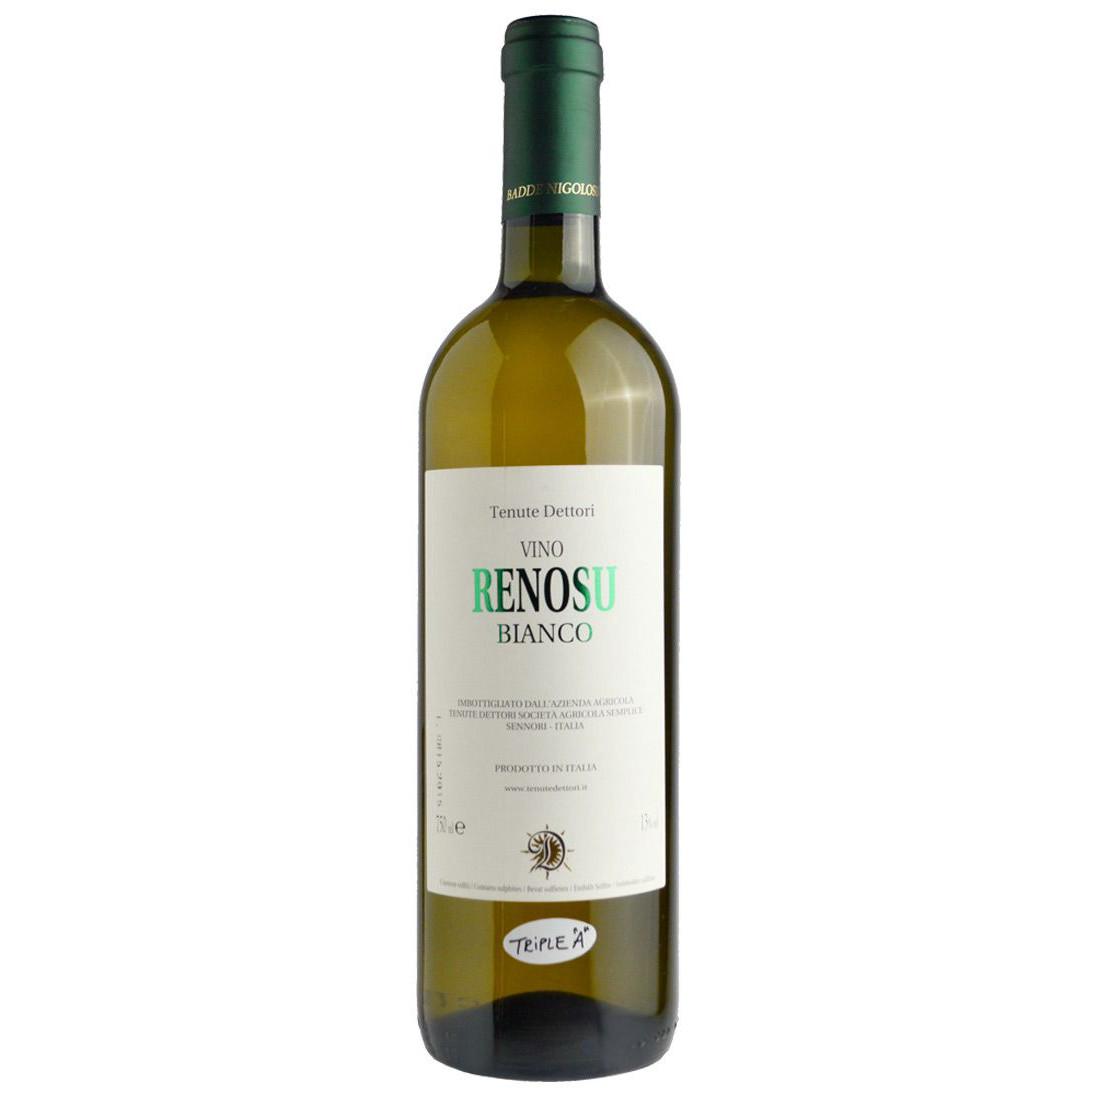 Tenute Dettori - Vino Bianco Renosu - Triple A -